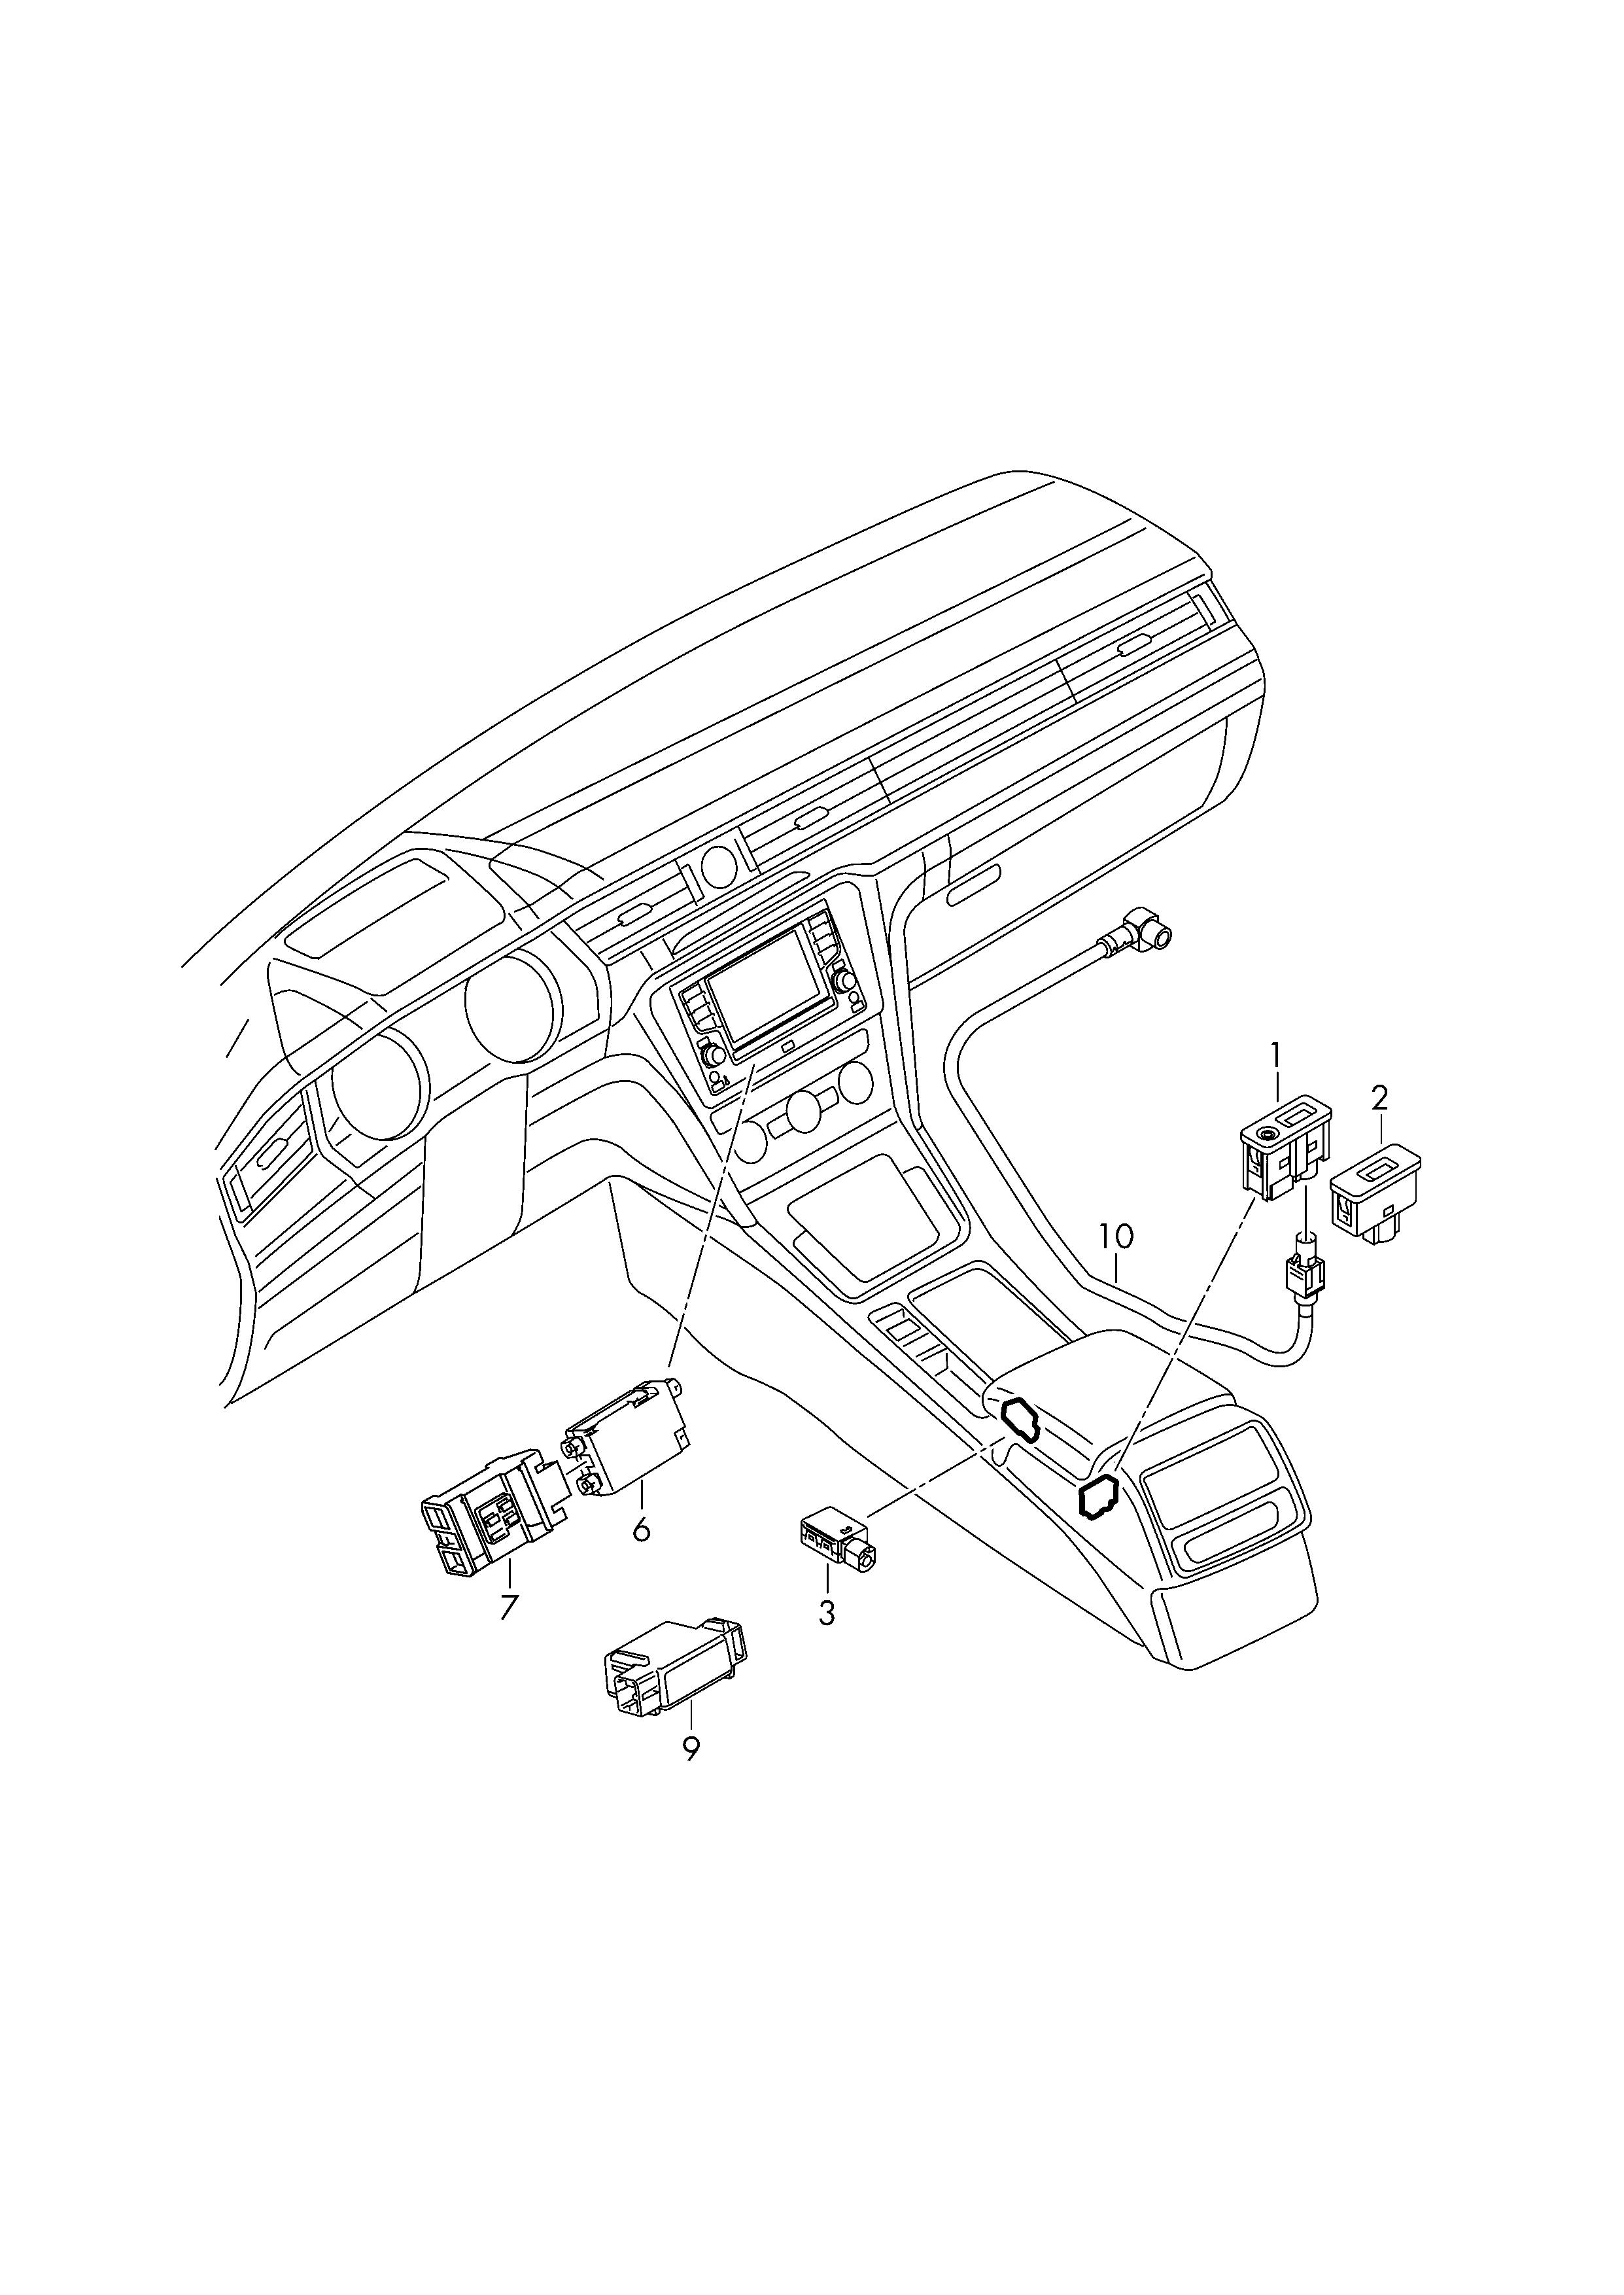 Centre Front Arm Rest - Skoda Superb Mk Iii